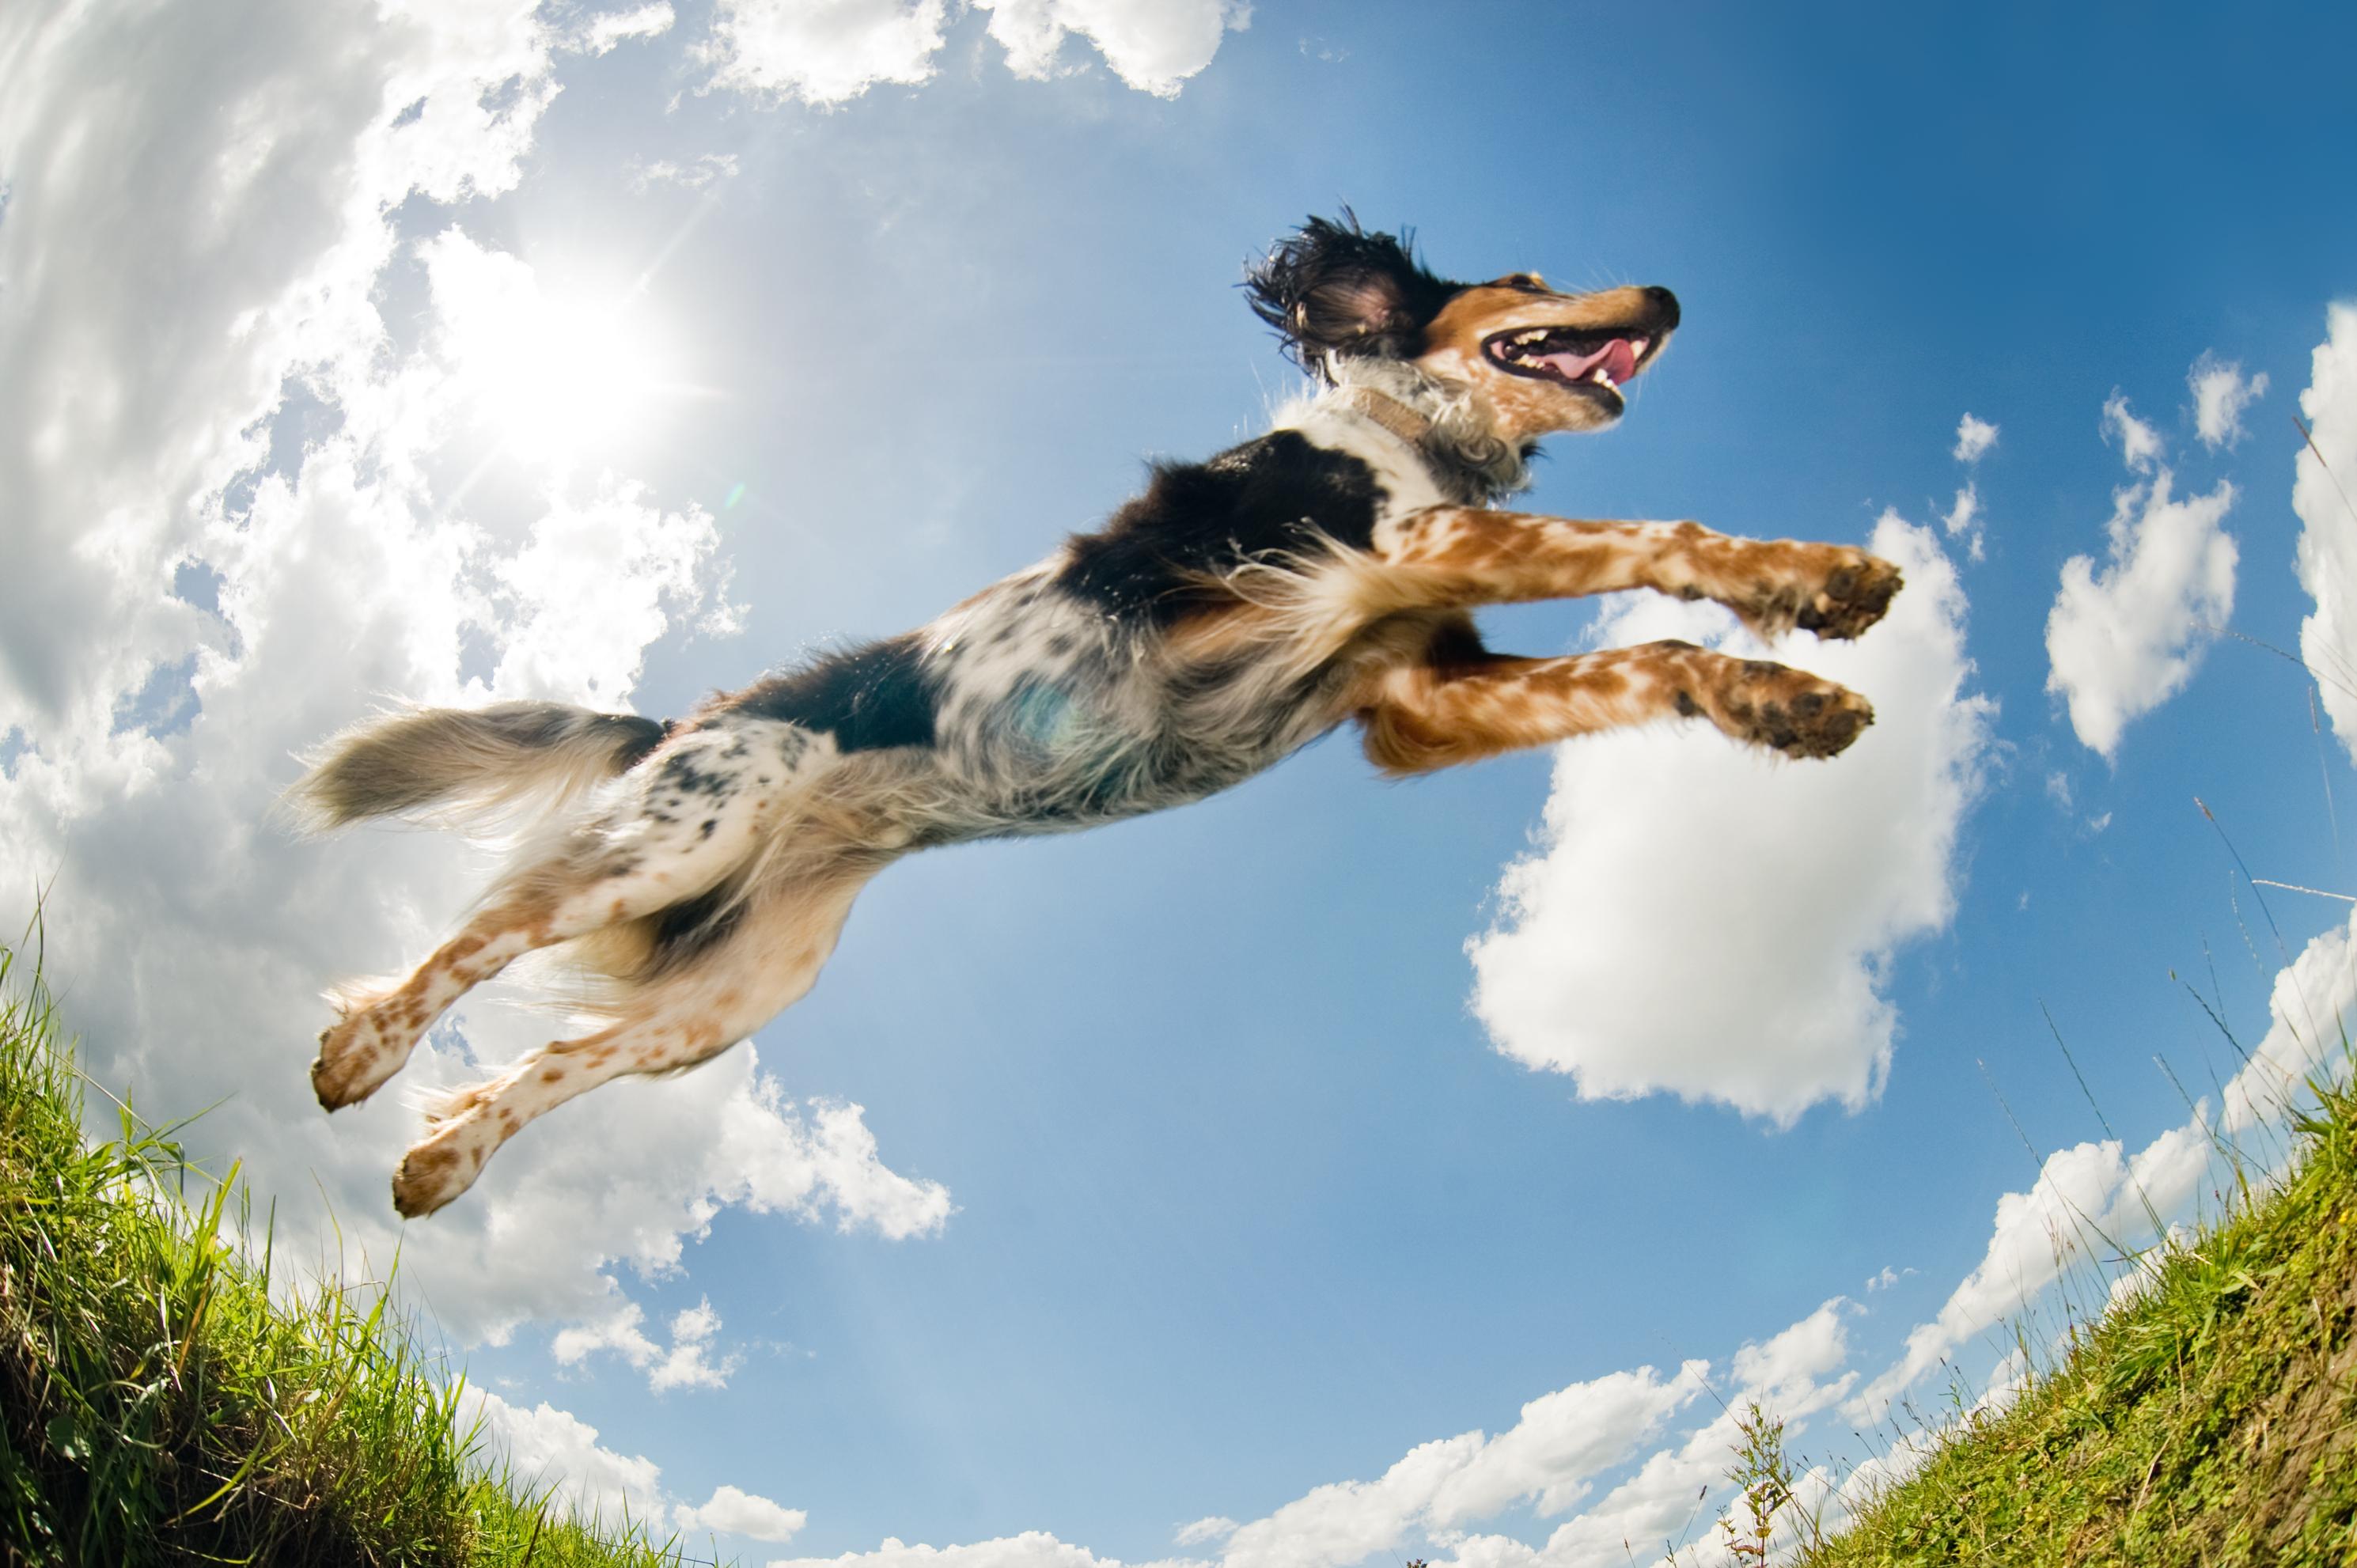 Jumping dog                                  (A Lobke Peers)